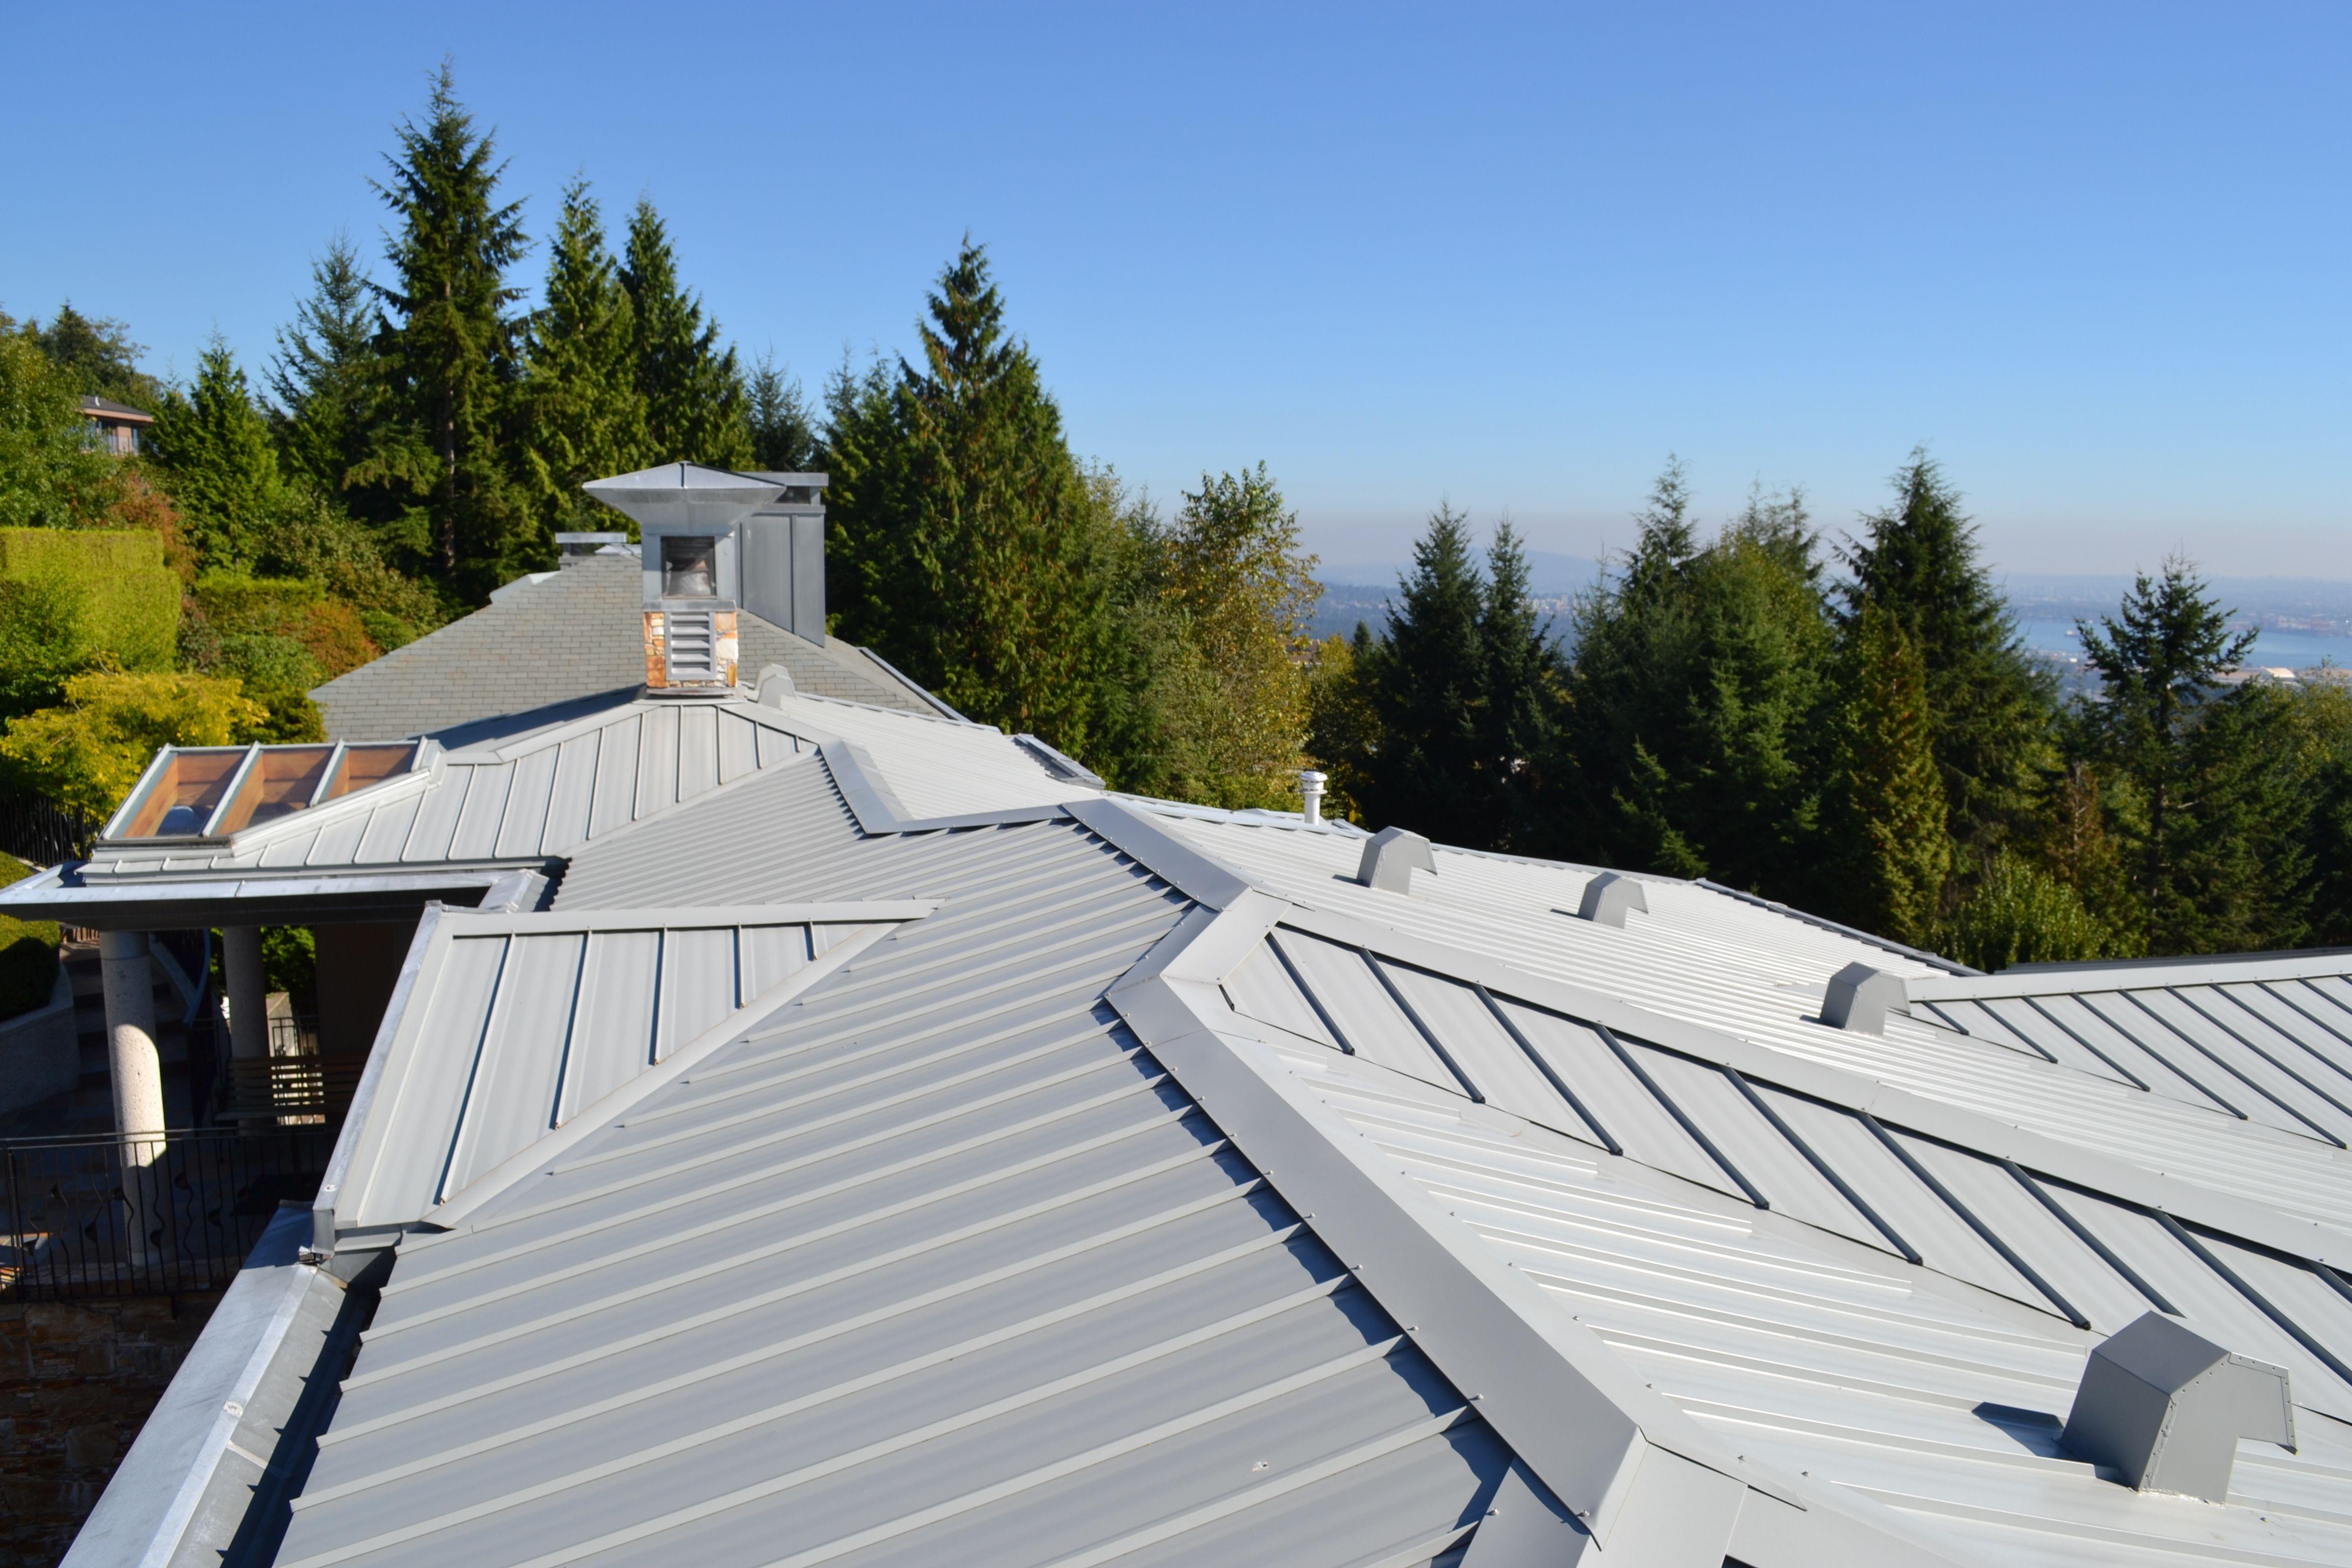 Roof Shingles Roof Shingles Asphalt Roof Asphalt Roof Shingles